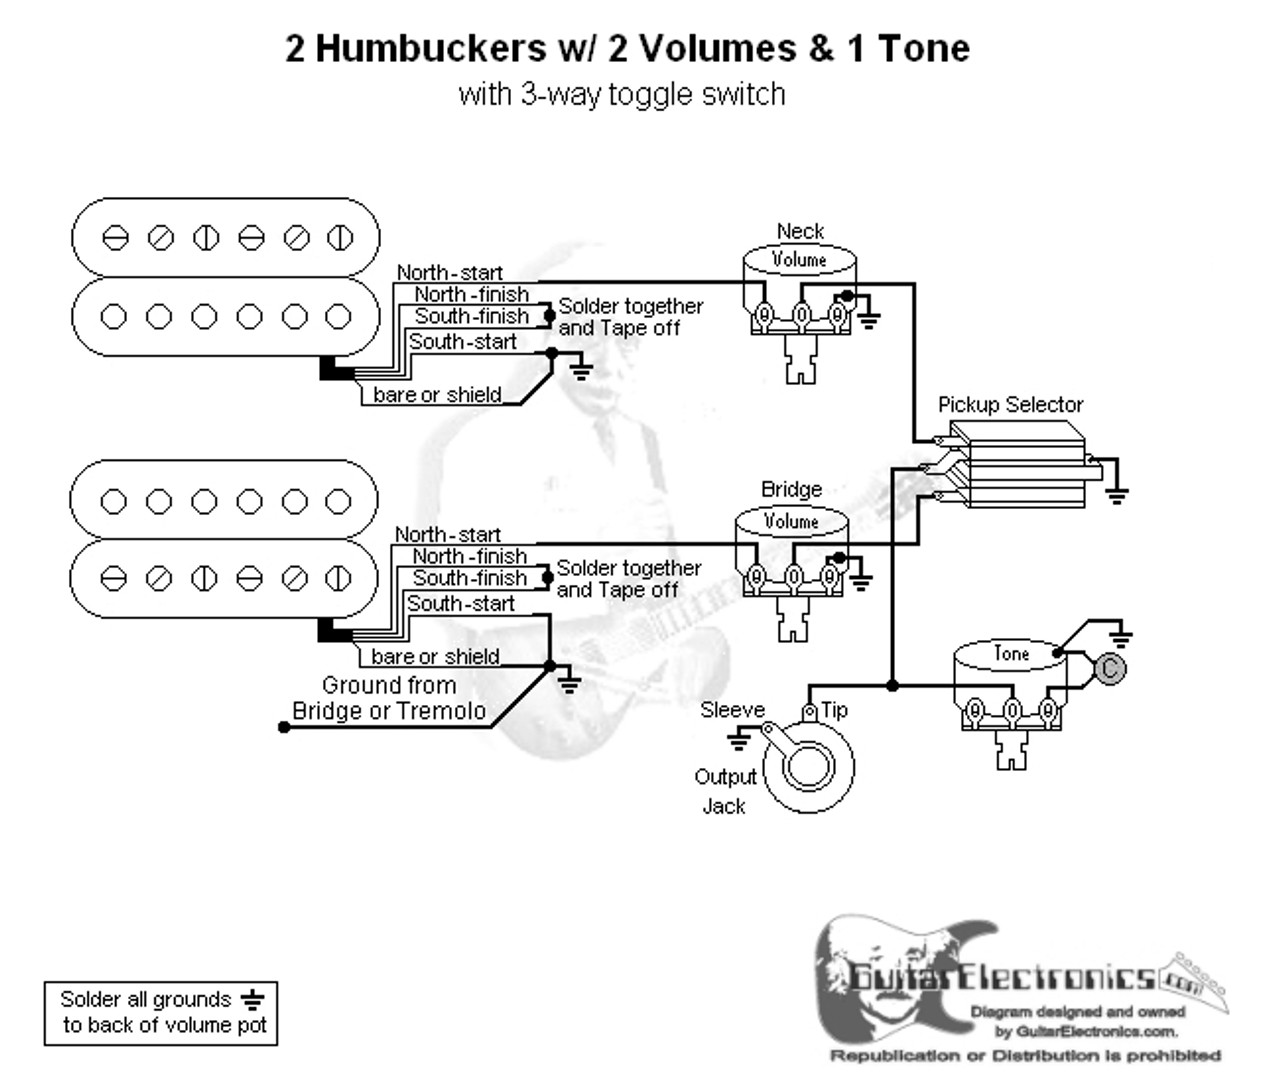 best quality electric guitar wiring harness kit 3 way toggle switch 2  volume 1 tone 500k  black diamond tattoo parlor